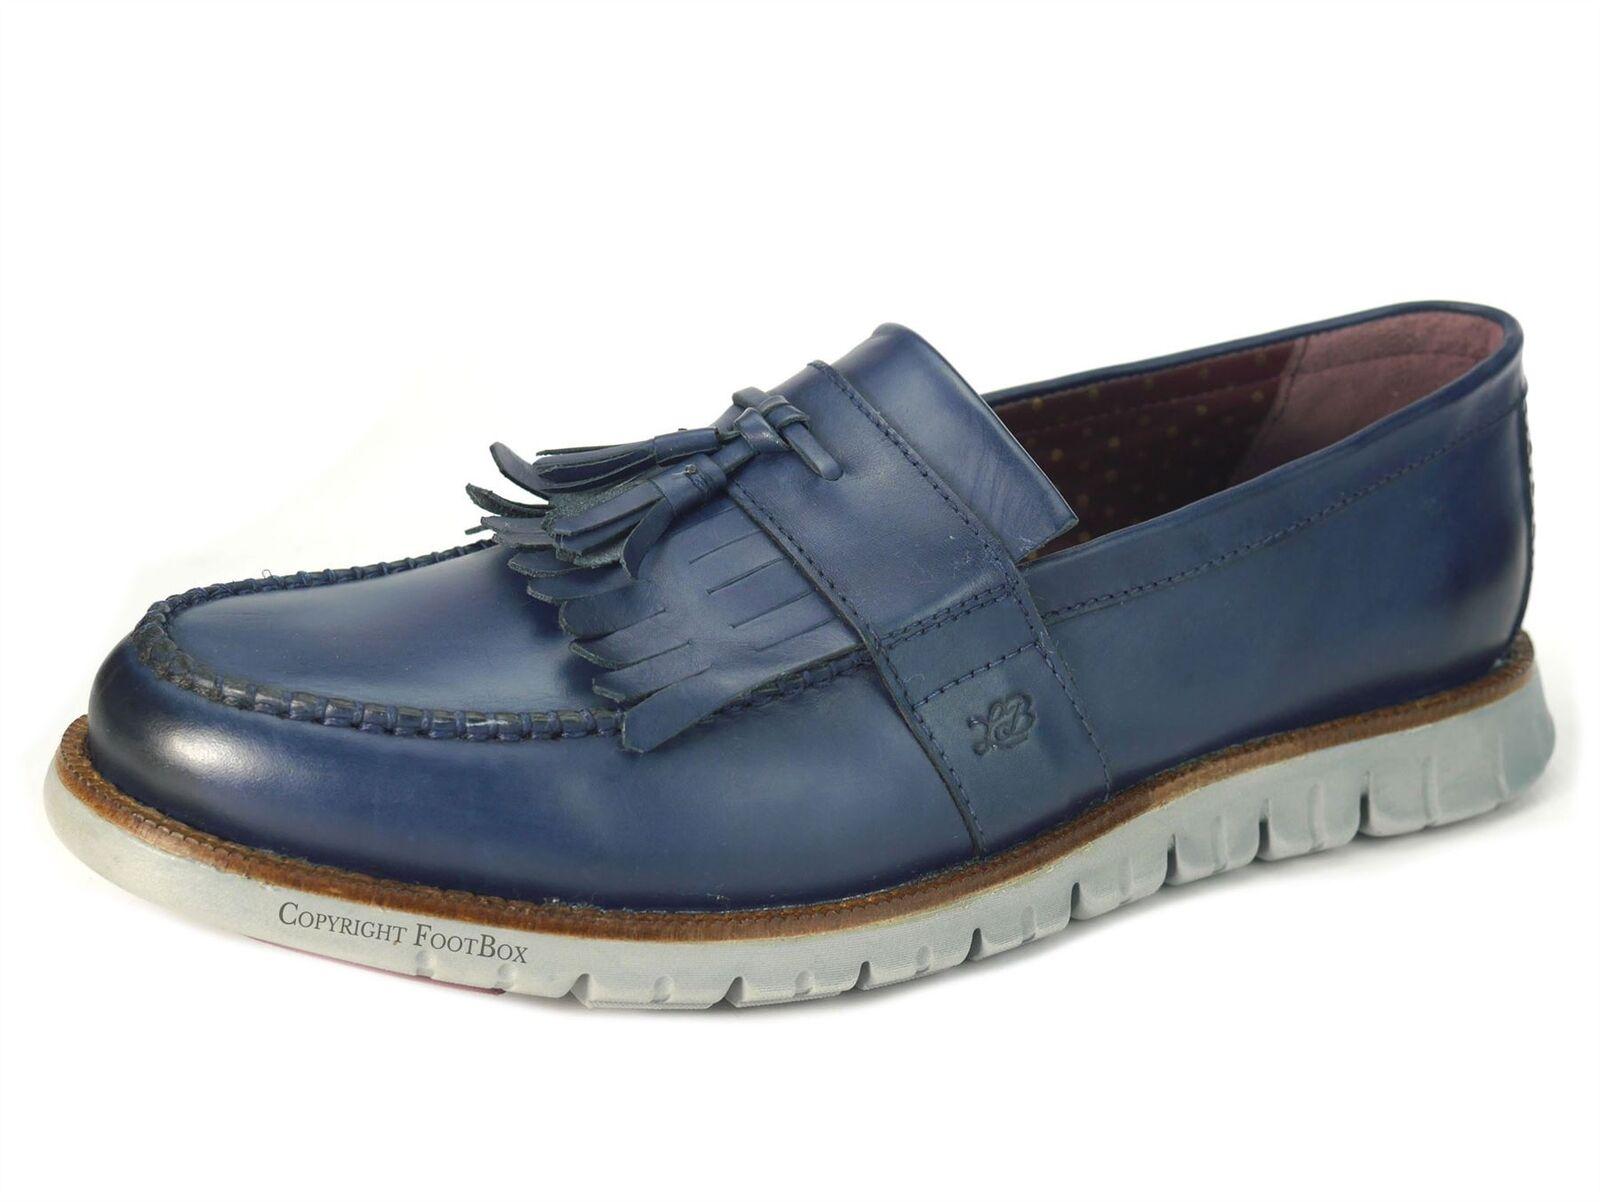 London Brogues Gatz Scarpe UOMO MOCASSINI CASUAL ULTRA scarpe leggere Scarpe Gatz Blu Marina d161b2